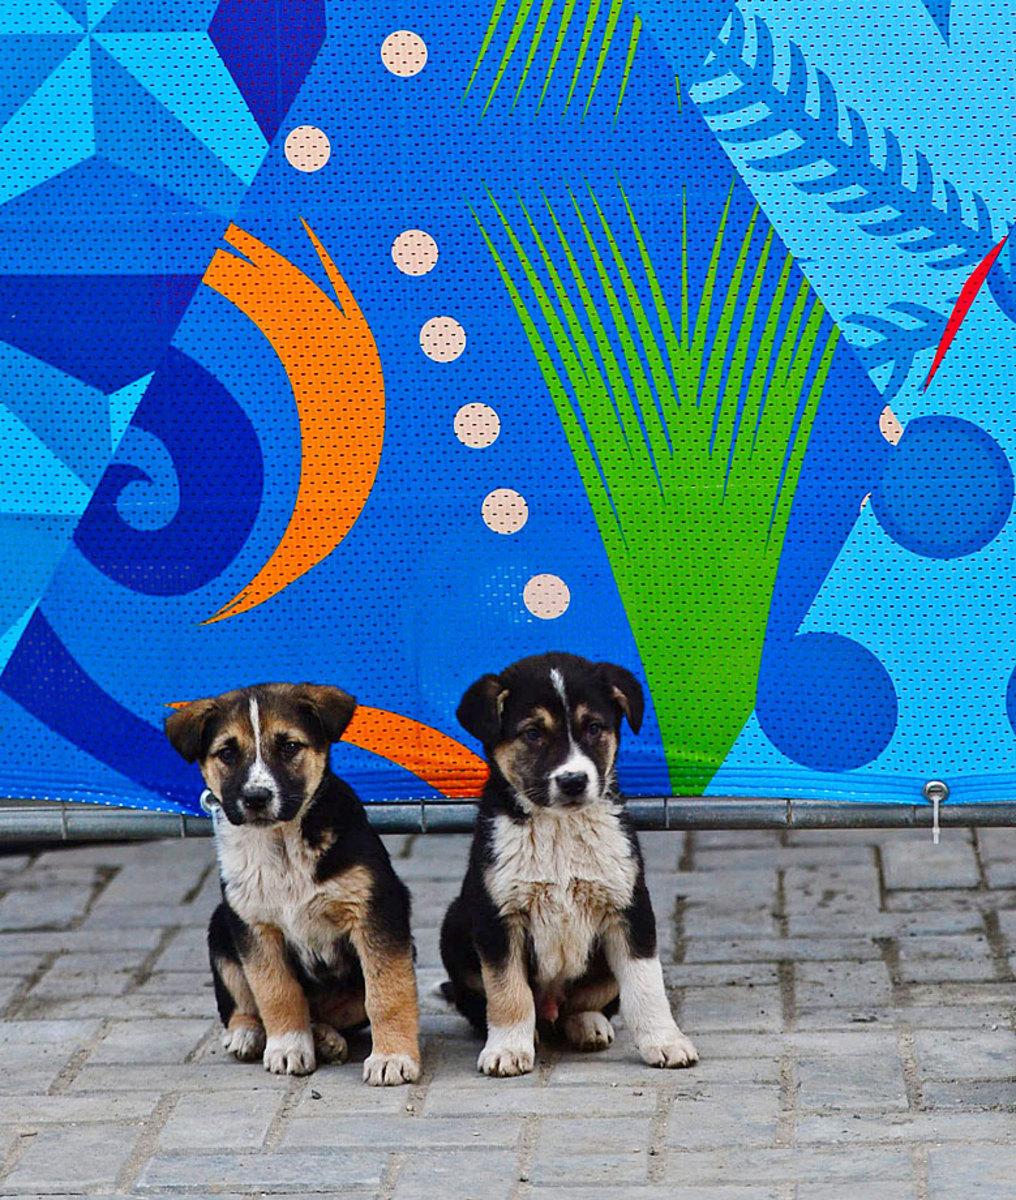 sochi-olympics-stray-dogs-opbc-1869.jpg